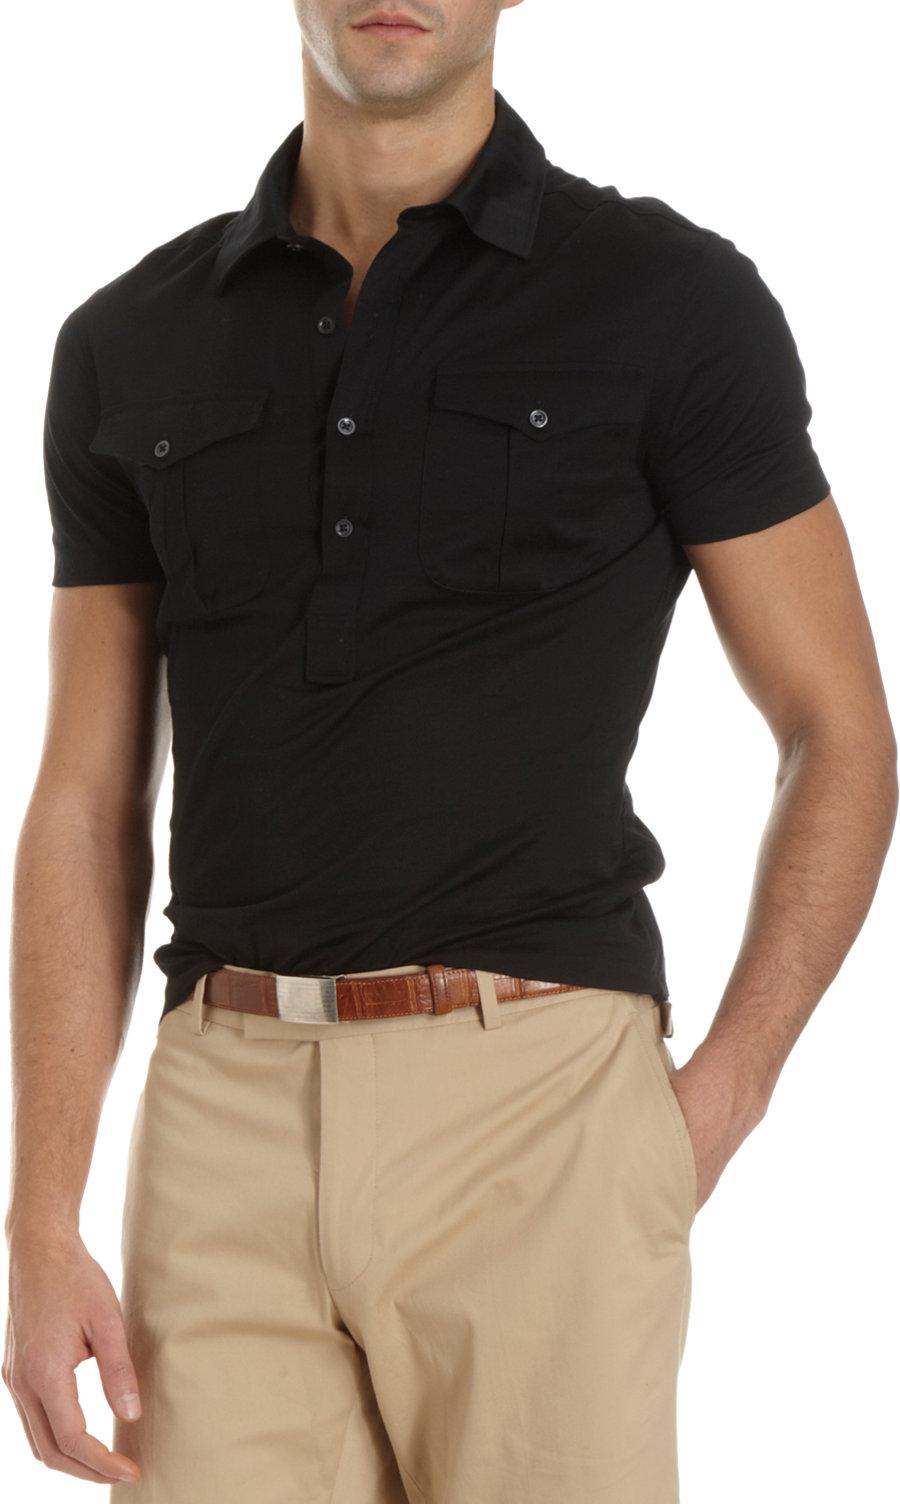 Lyst ralph lauren black label flap pocket polo in black for Ralph lauren black label polo shirt